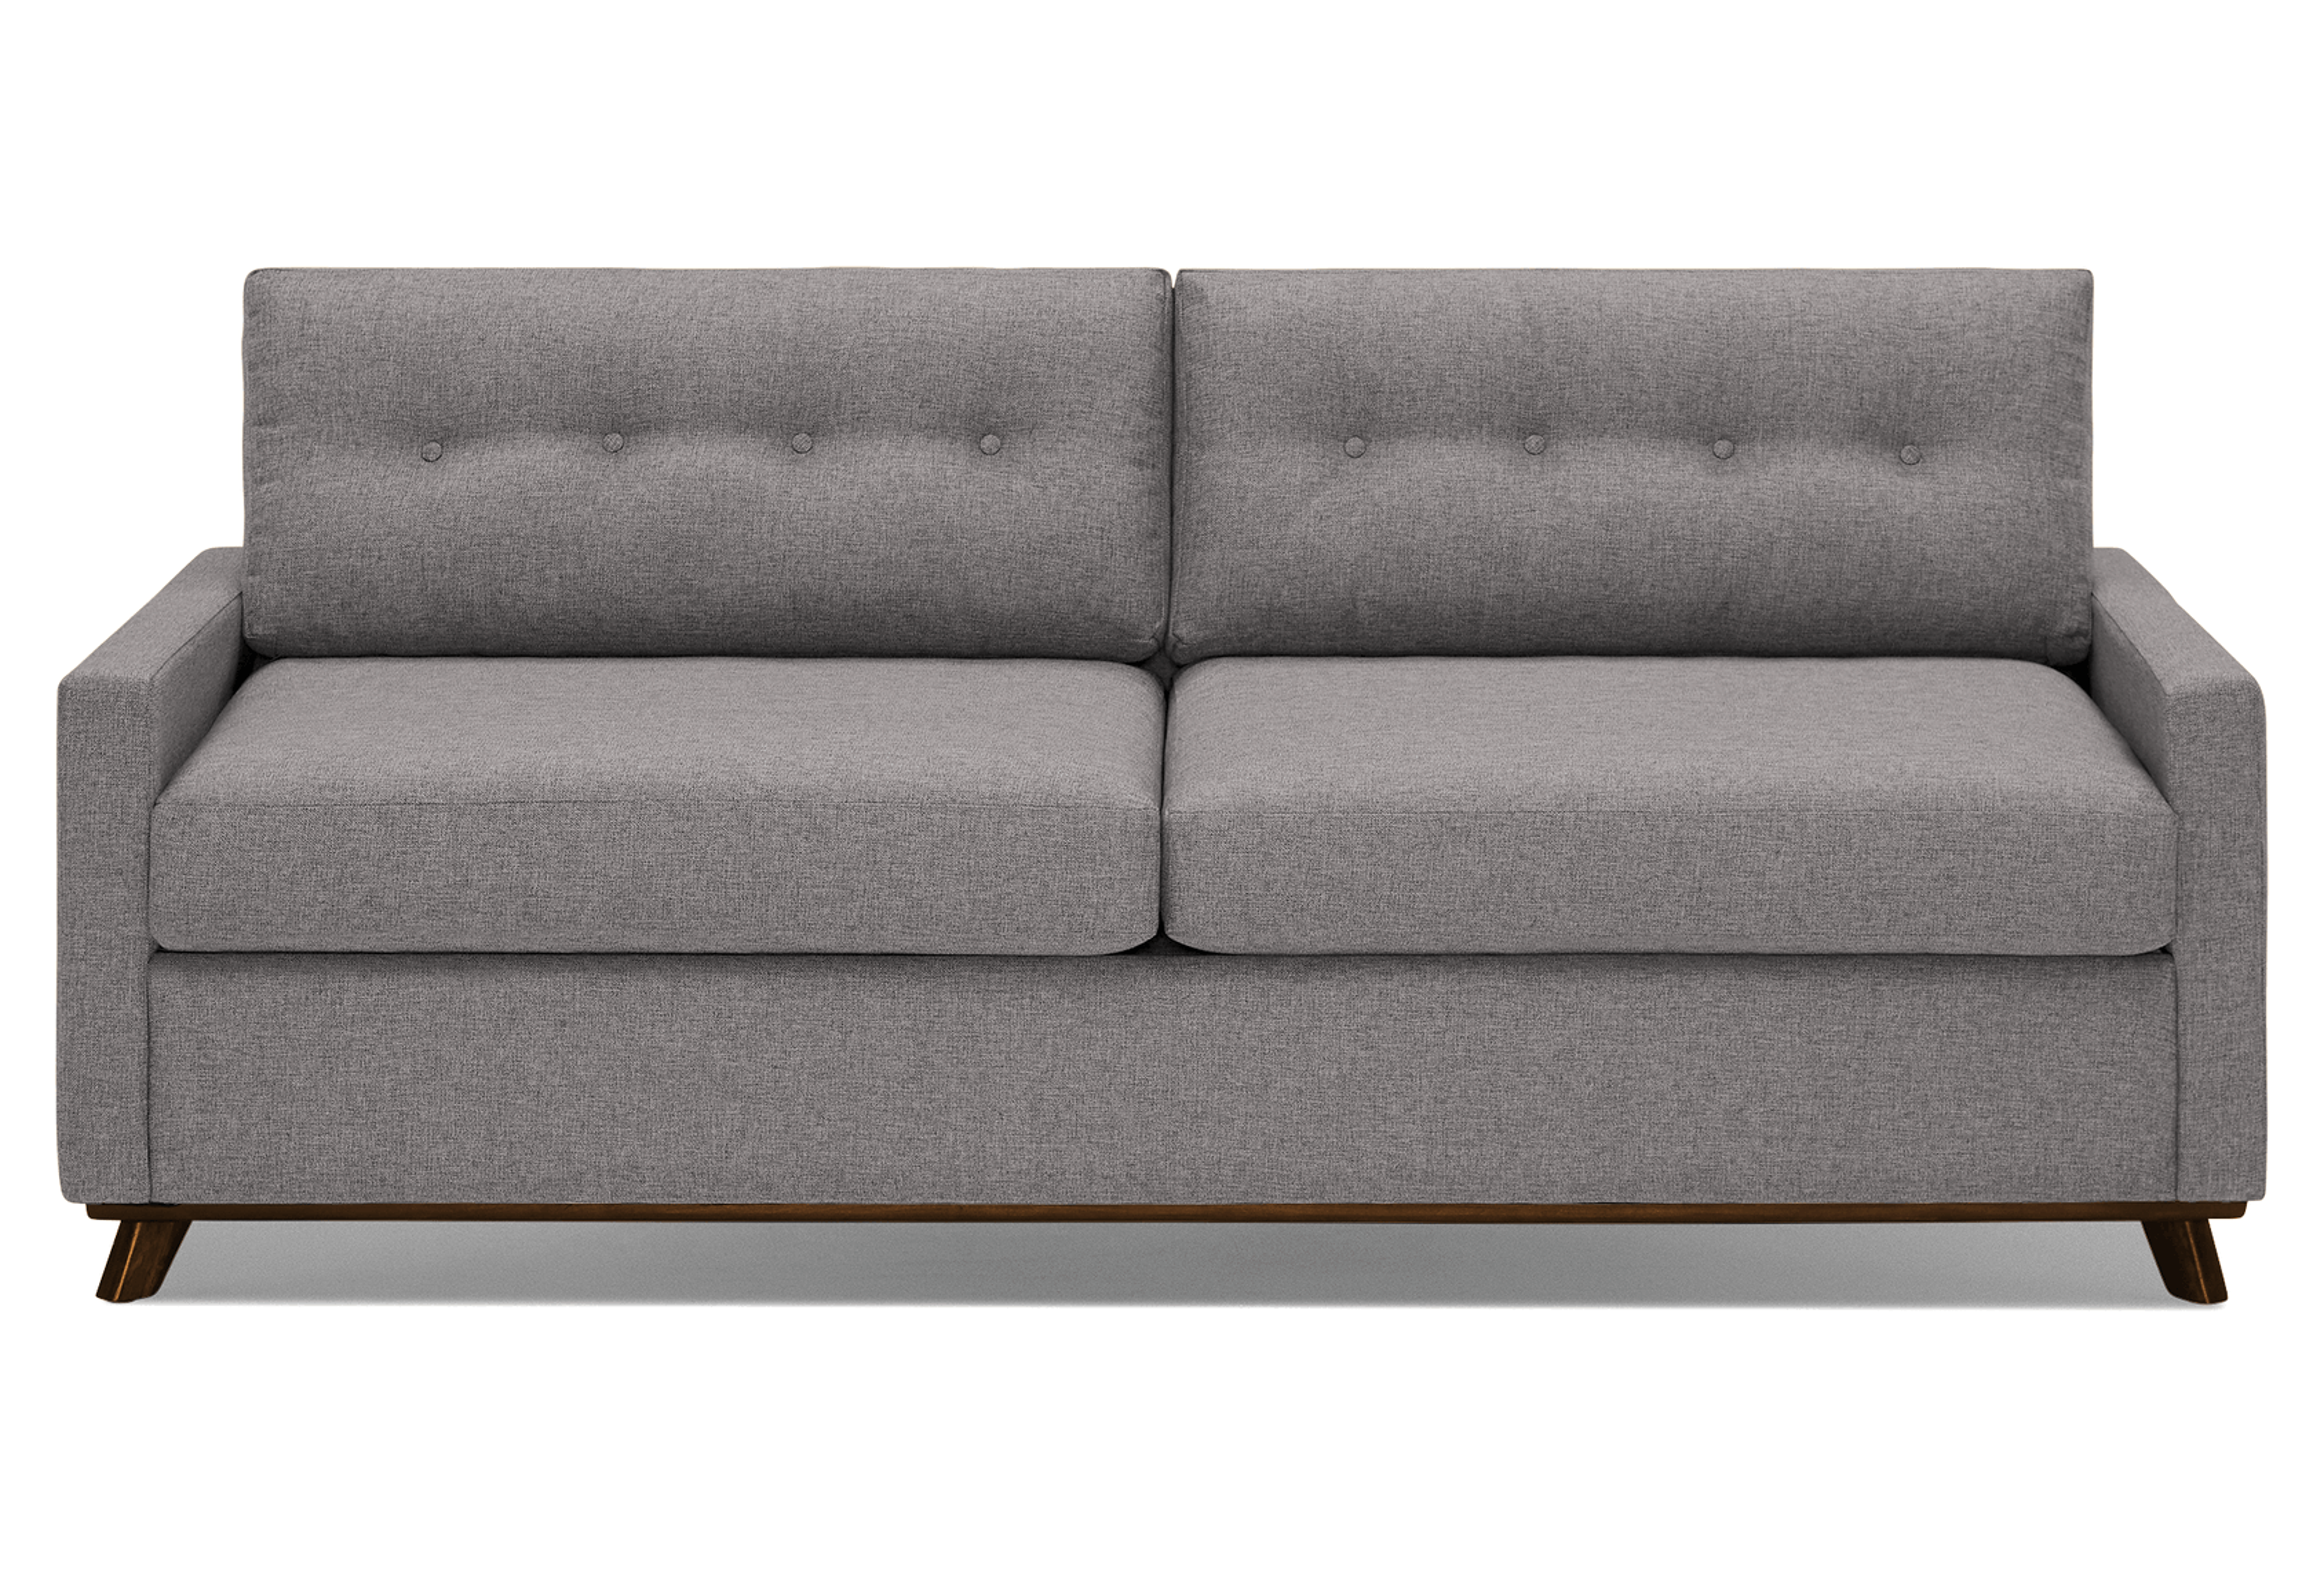 Hopson Sleeper Sofa   Joybird